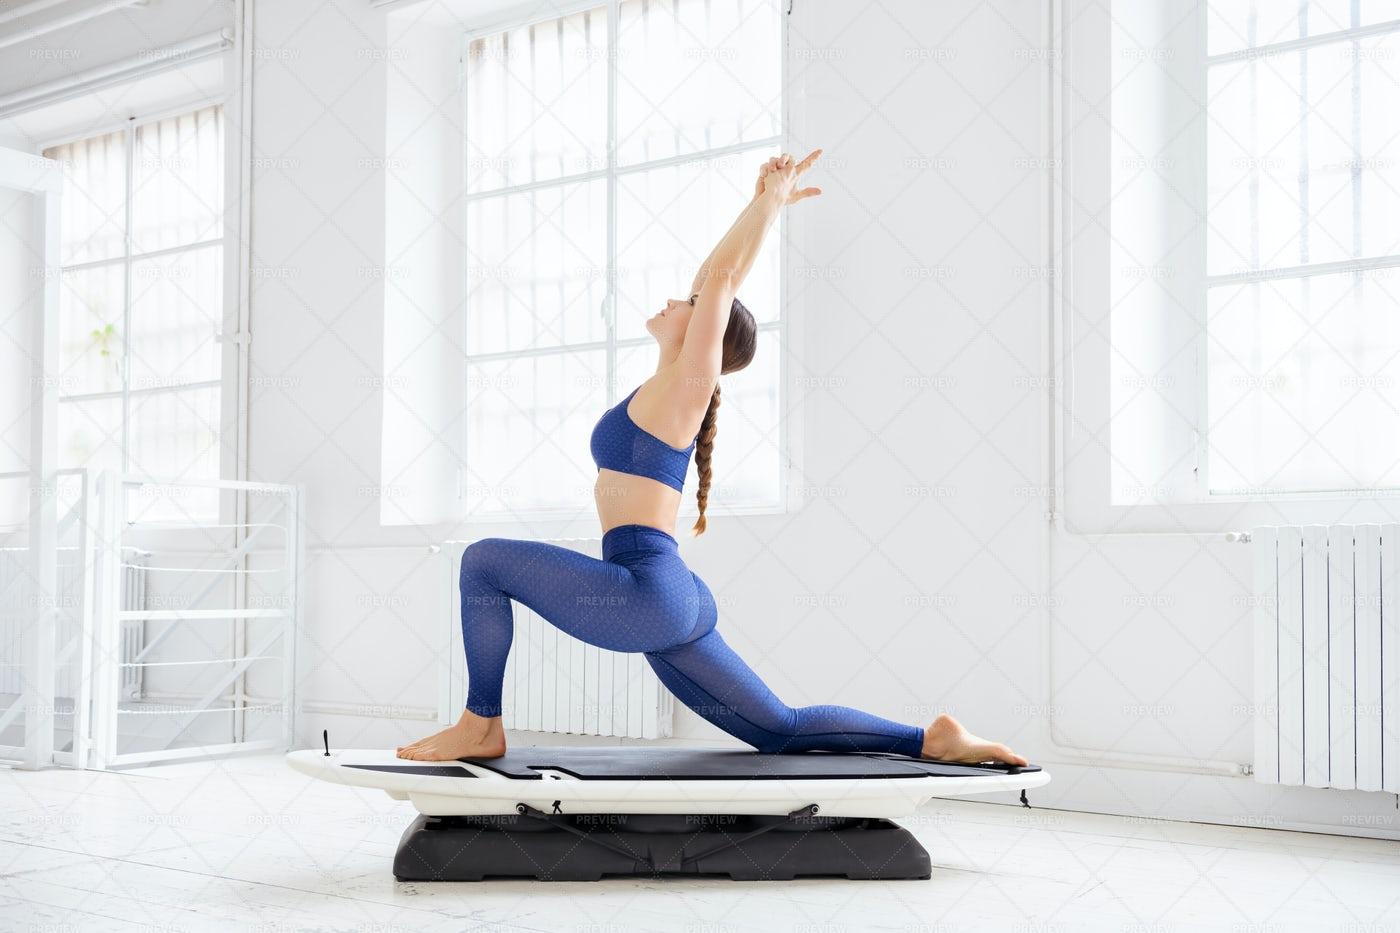 Surf Set Yoga Pose: Stock Photos